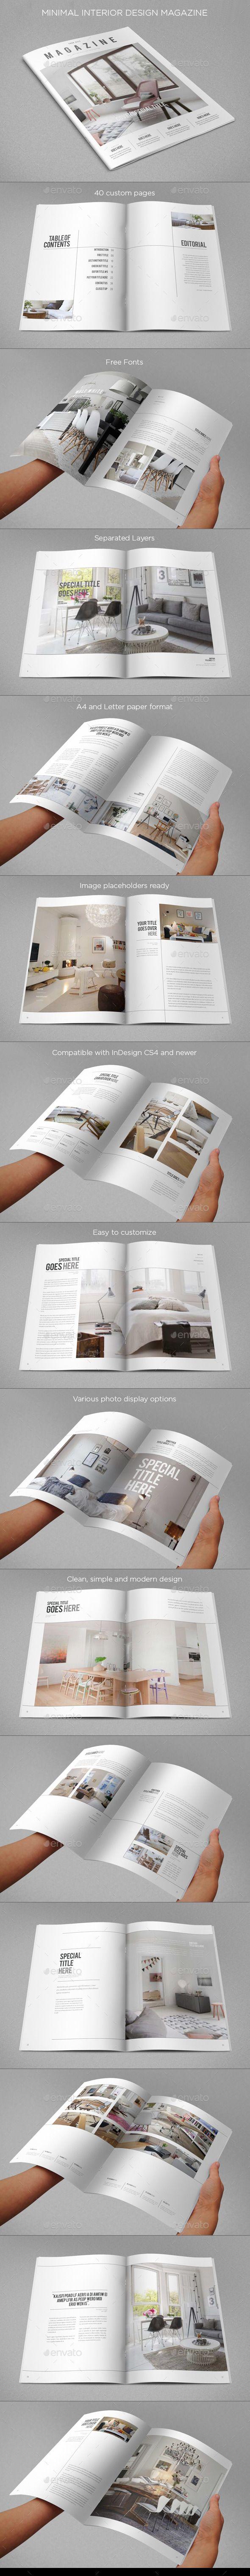 Minimal Interior Design Magazine Template | Download: http://graphicriver.net/item/minimal-interior-design-magazine/9499179?ref=ksioks